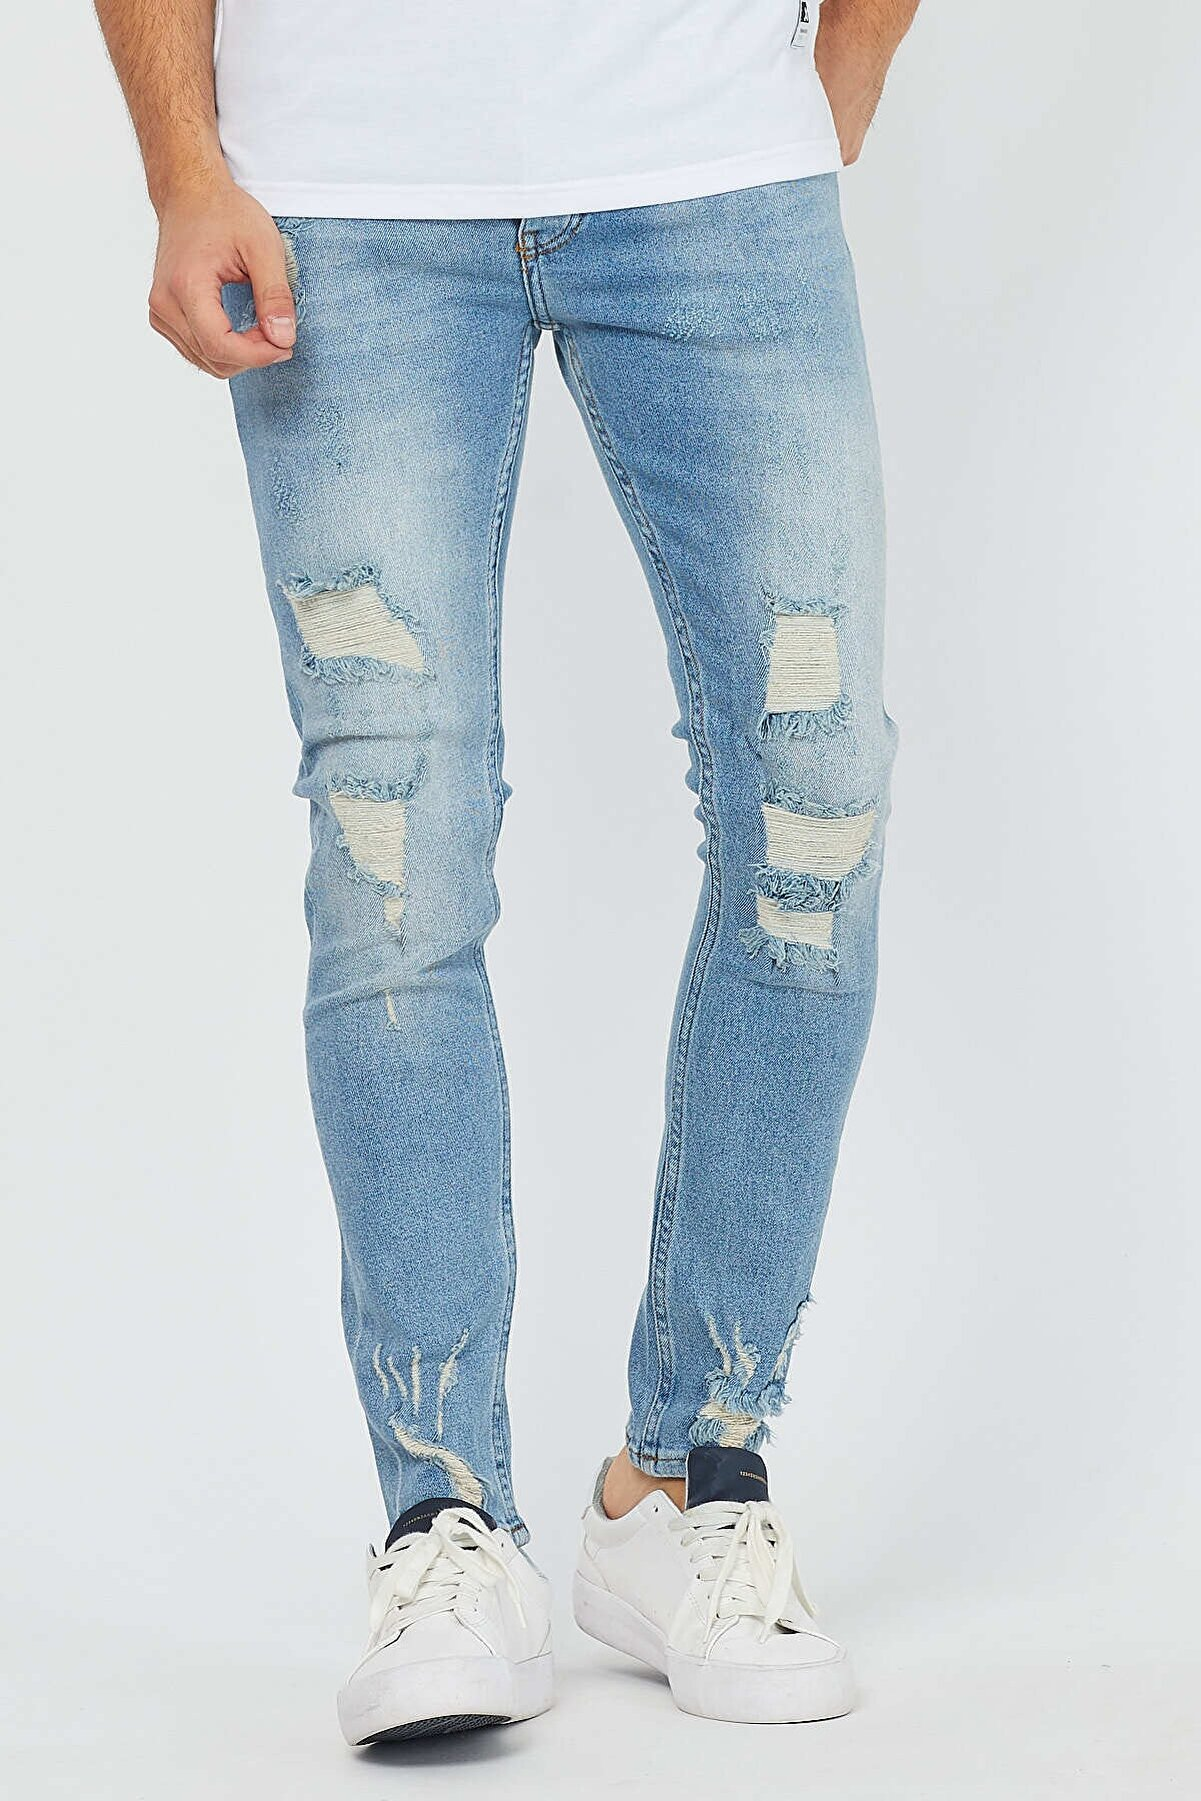 Denim Republic Erkek Mavi Yırtık Kot Pantolon Super Skinny